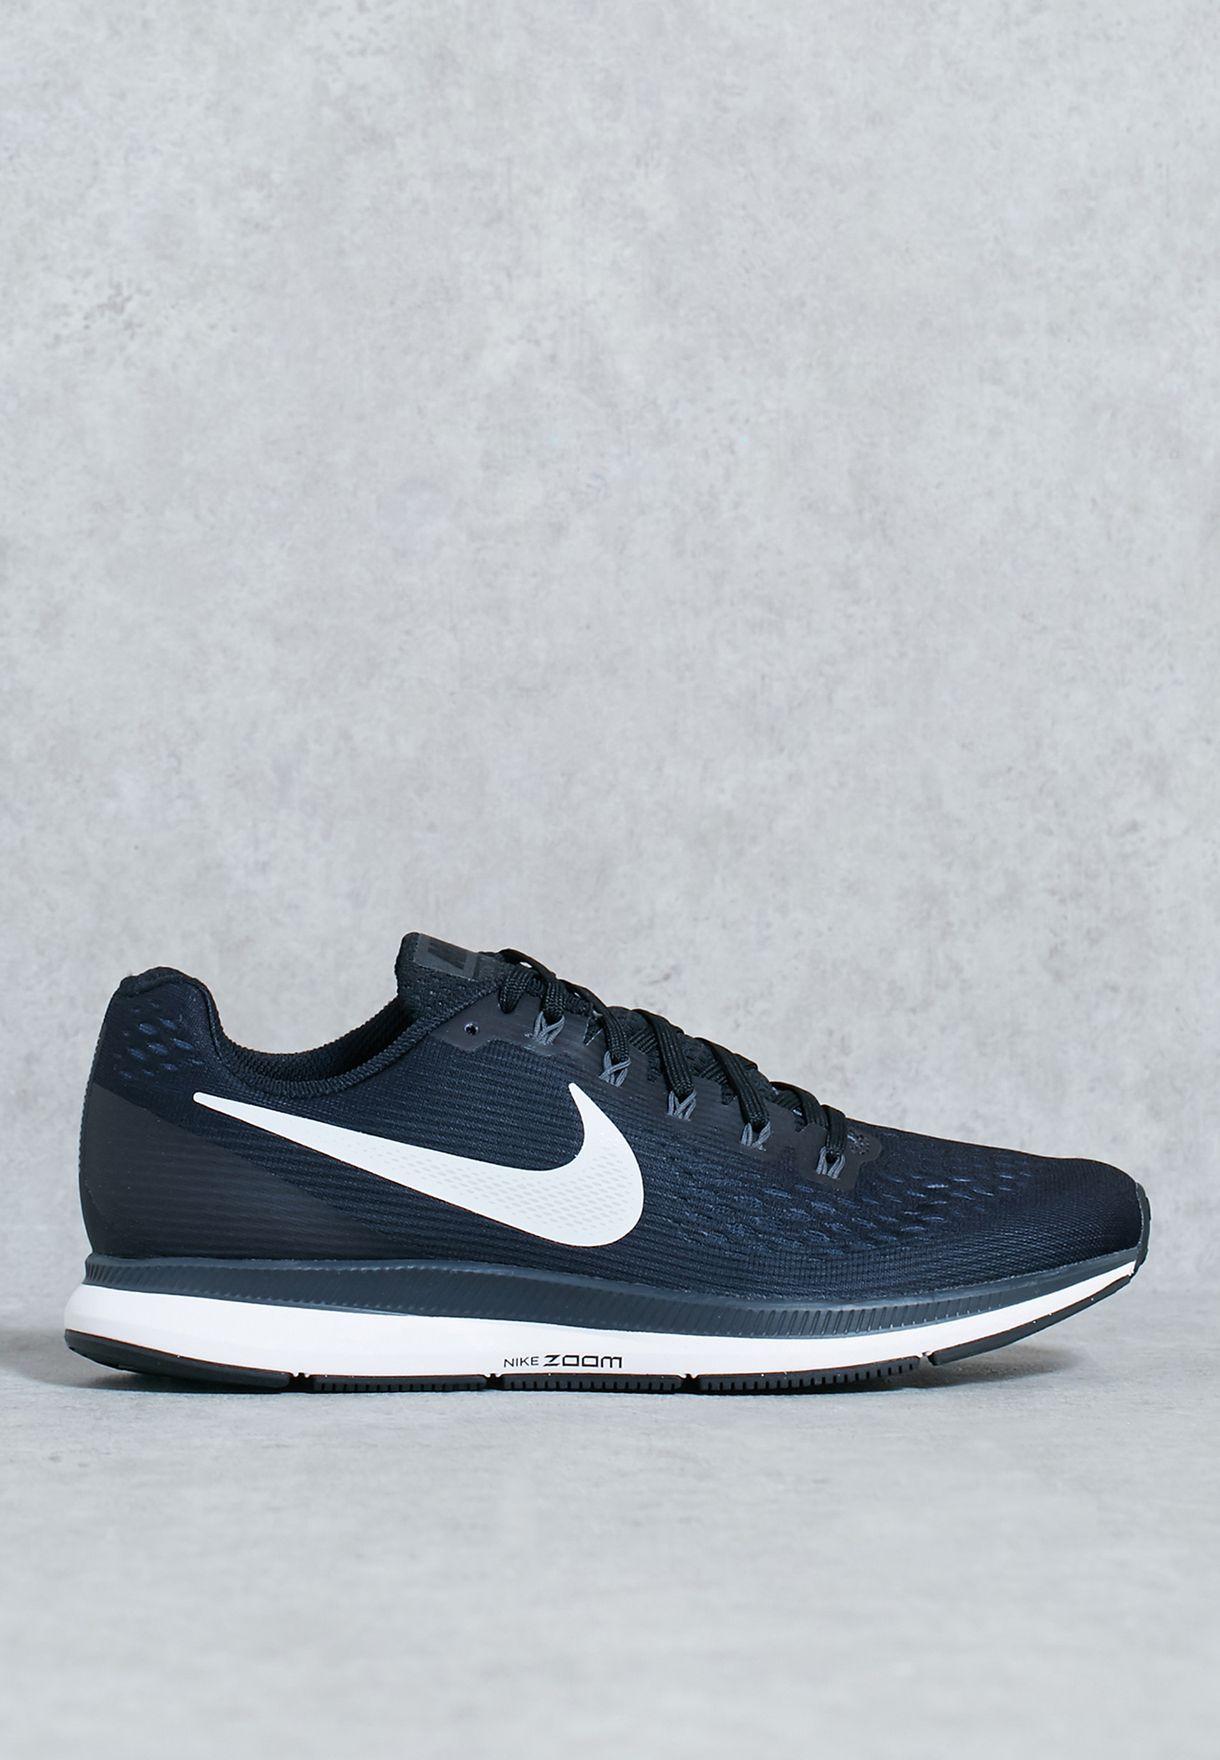 43a74470a782 Shop Nike black Air Zoom Pegasus 34 880555-001 for Men in Kuwait ...